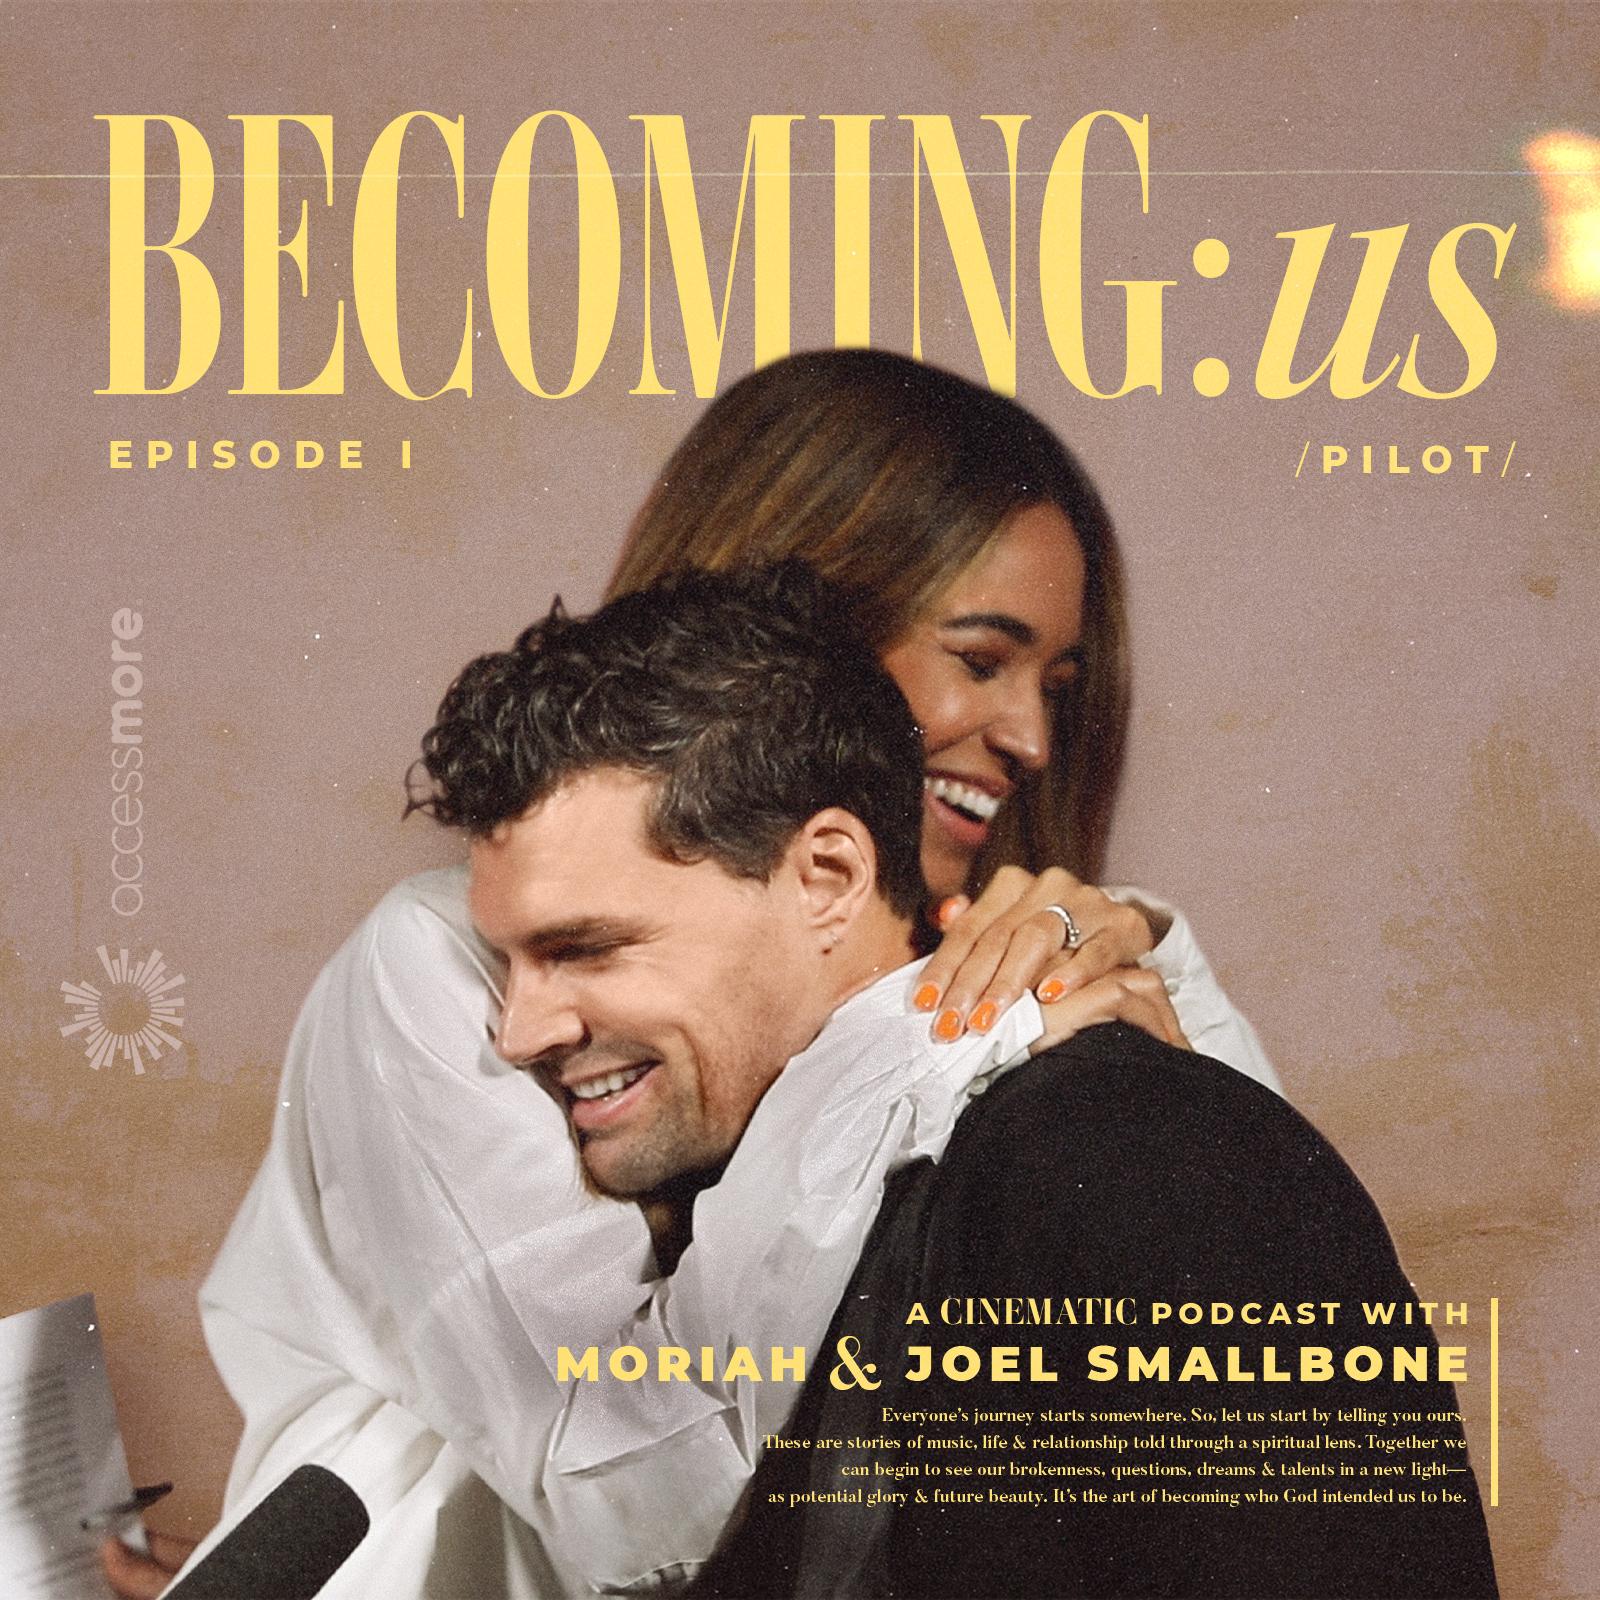 Ep 1 - BECOMING:us